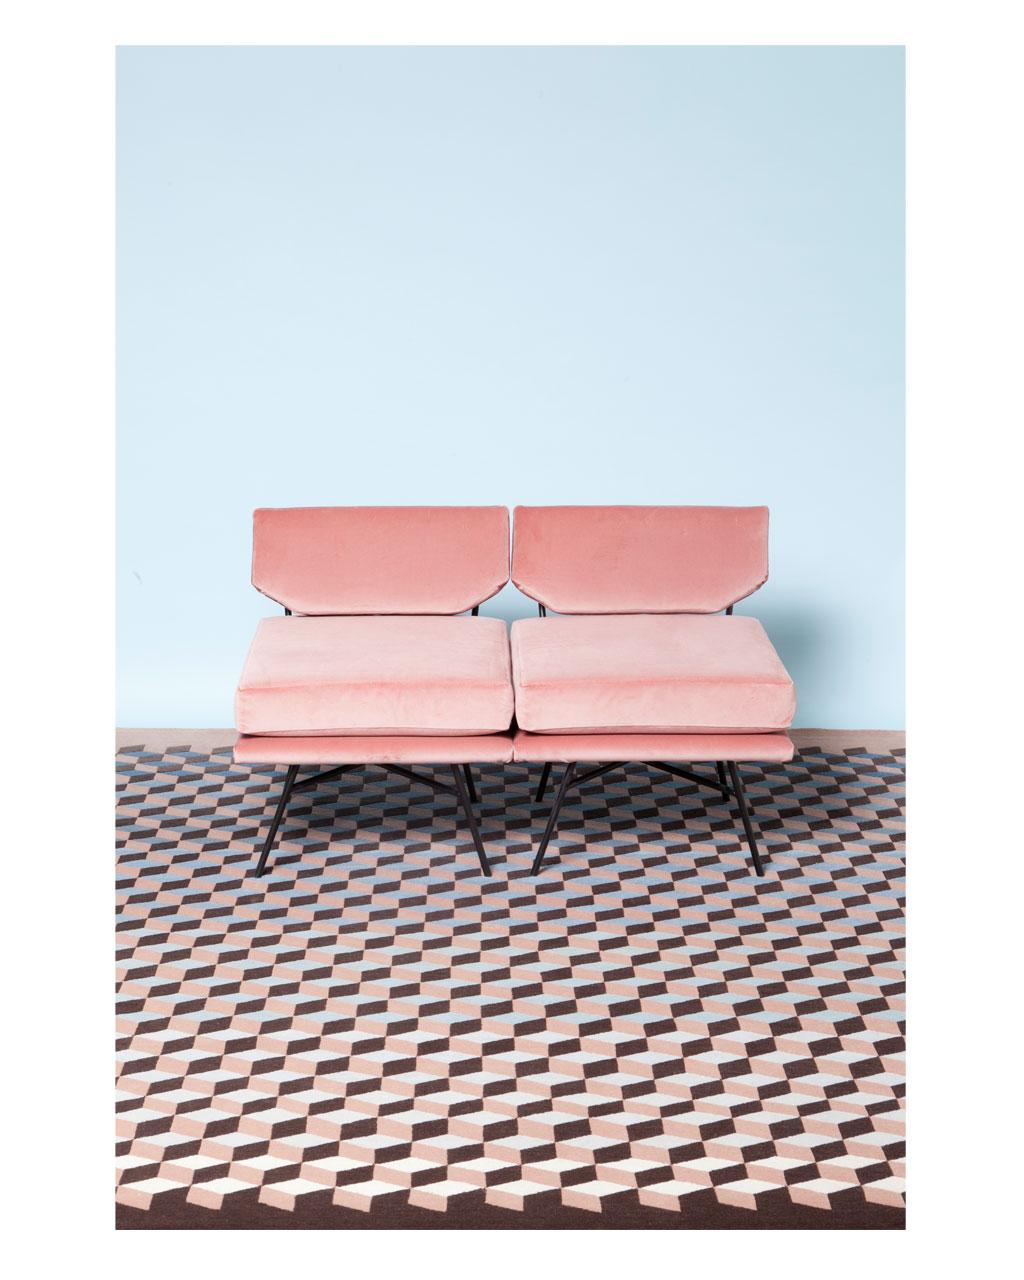 Pantone 2016 Rose Quartz et Bleu Sérénité || Tapis design Artnau